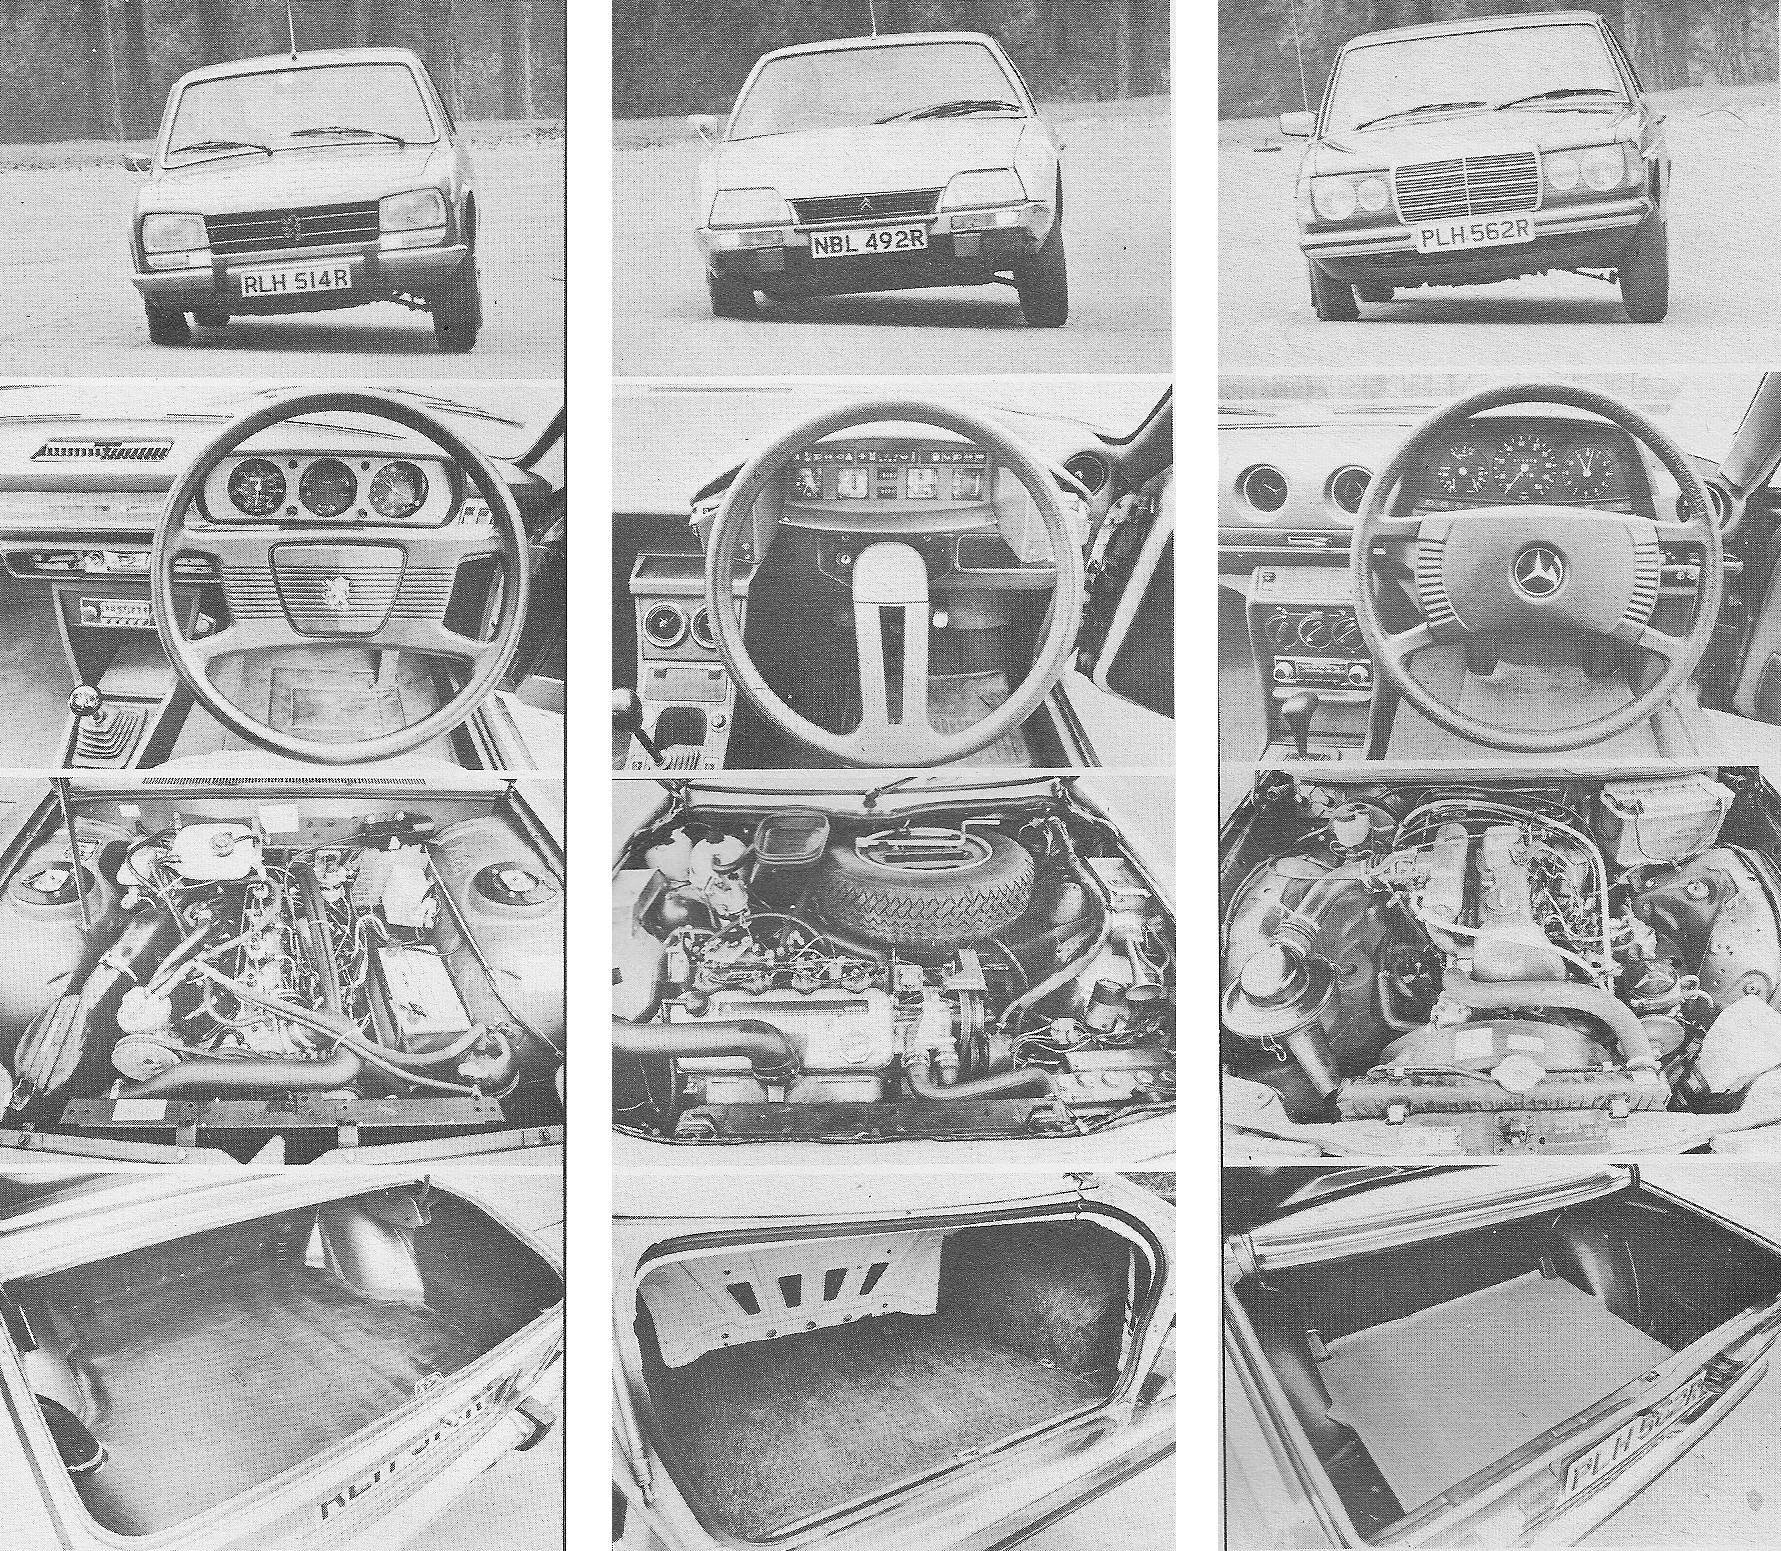 Giant Test Peugeot 504GLD Vs Citroen CX 2200D And Mercedes